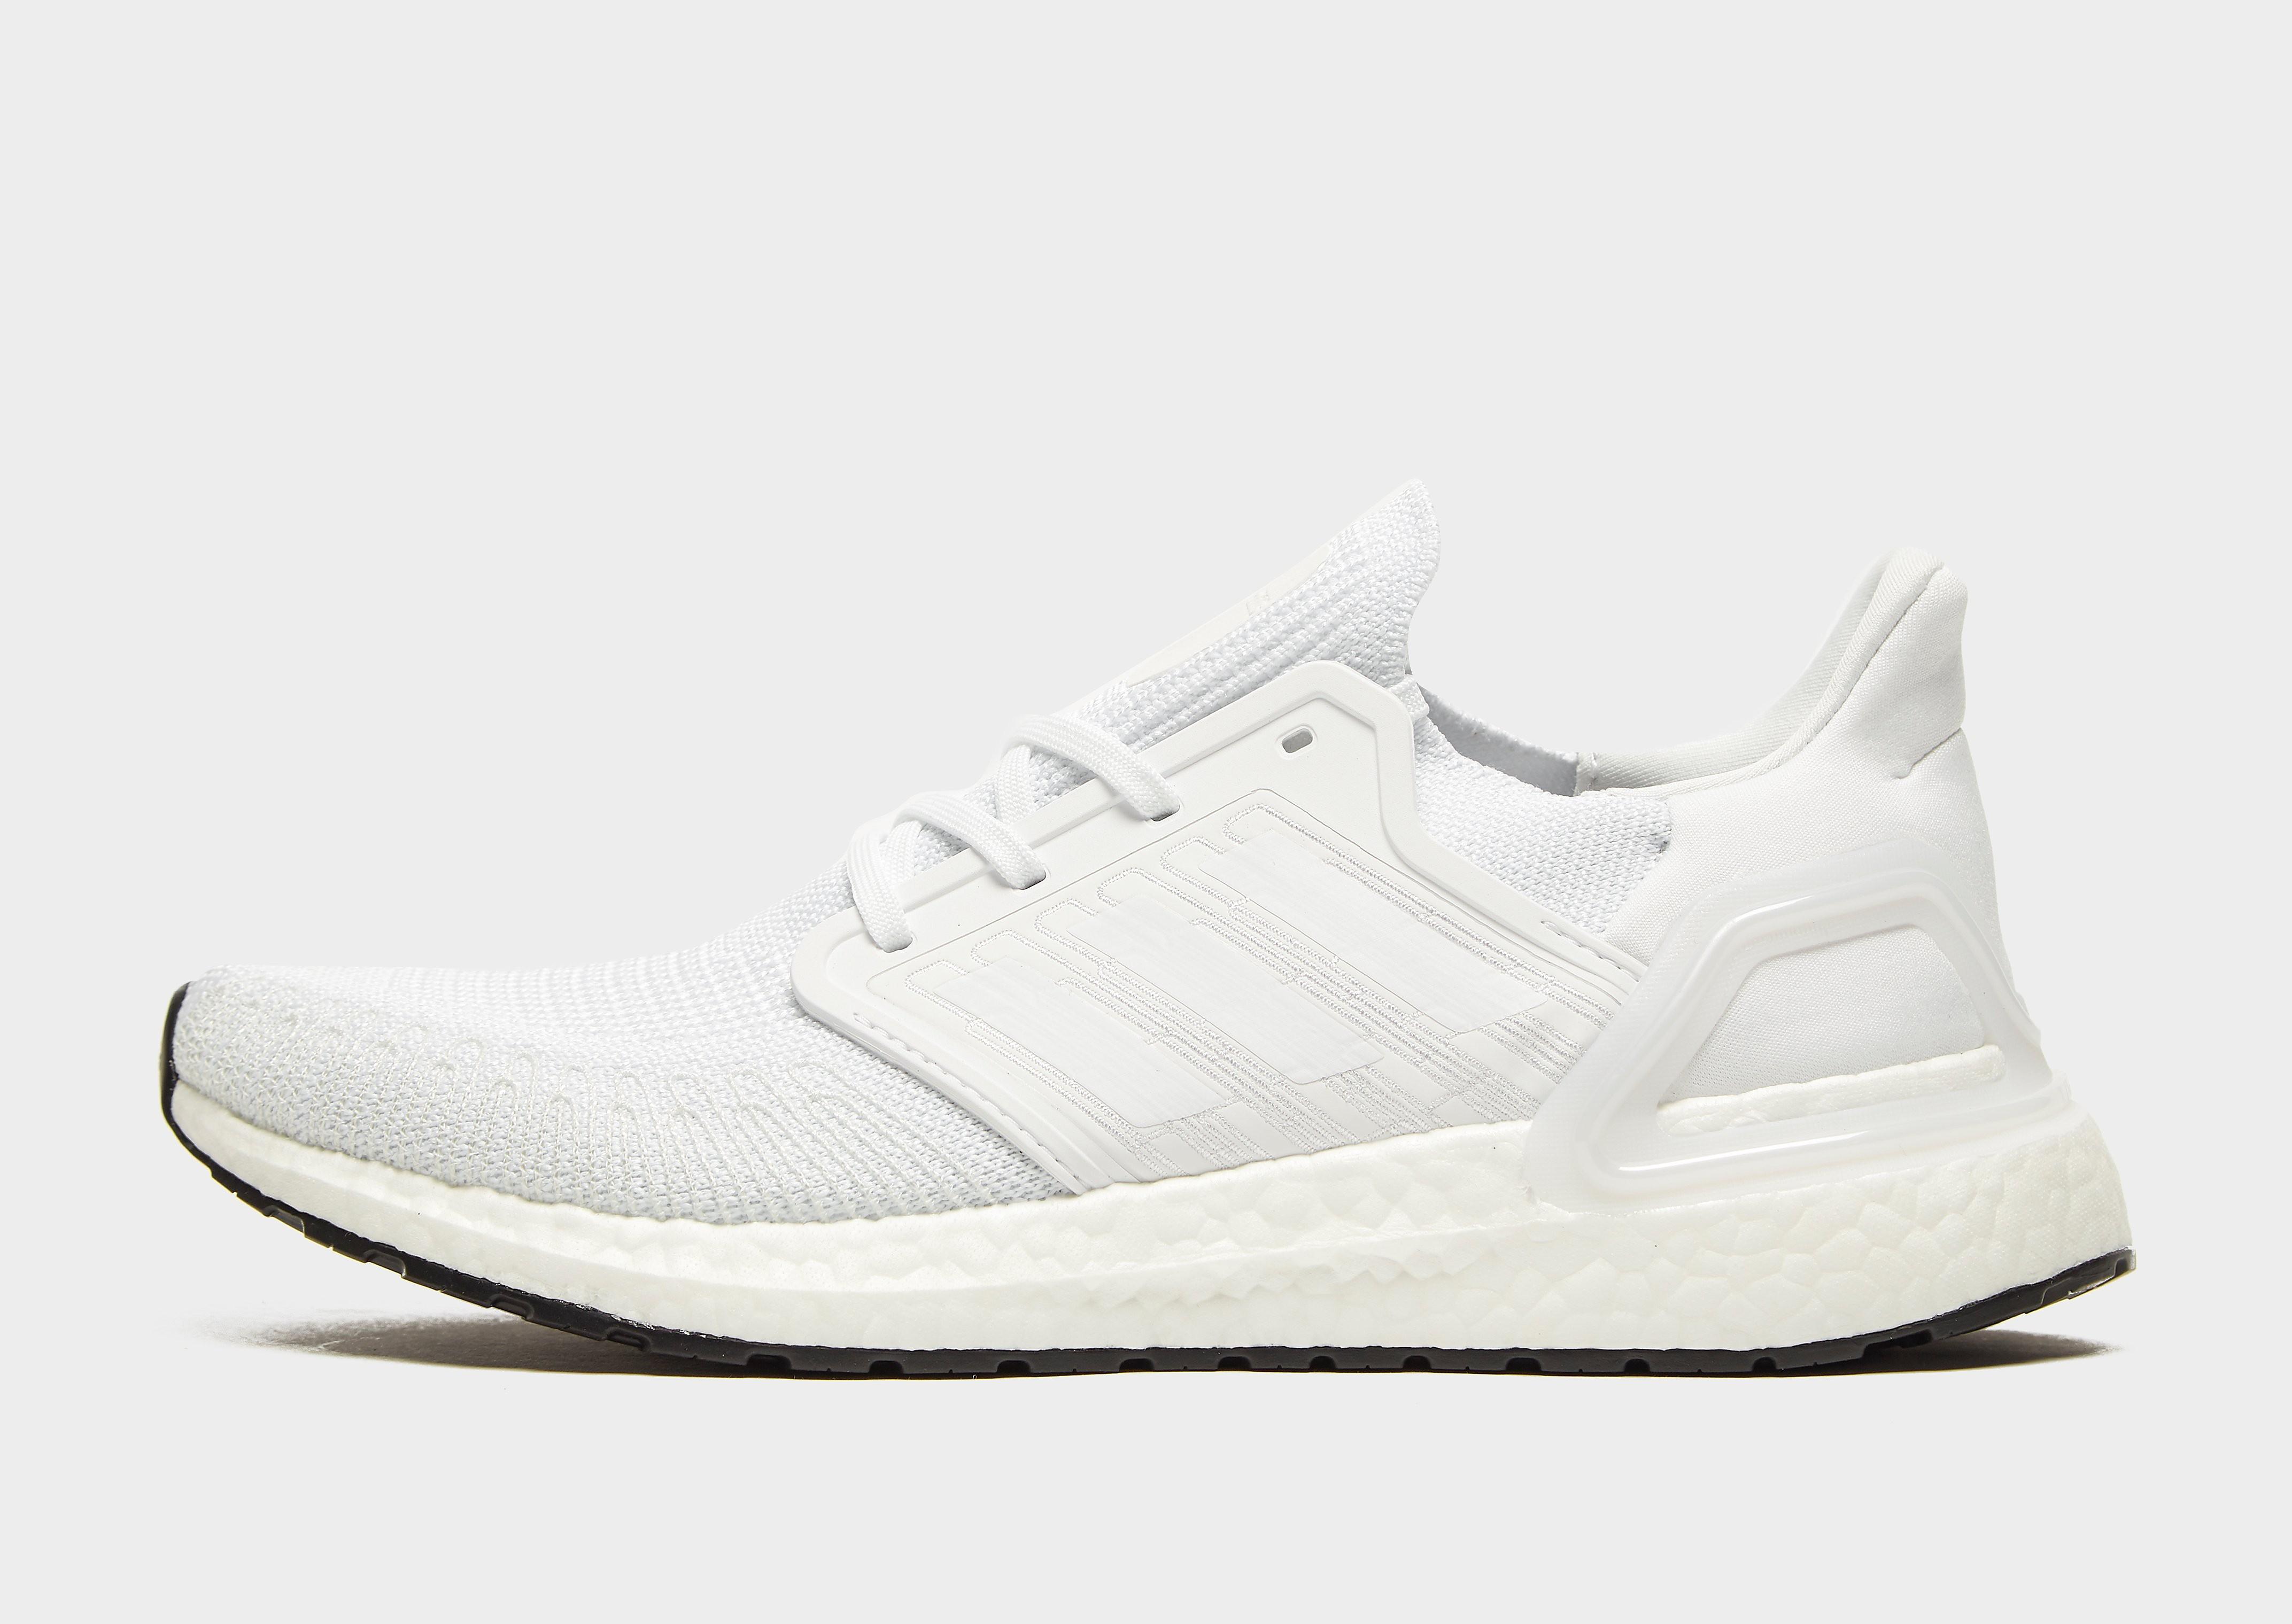 Adidas Ultra Boost 20, Blanco